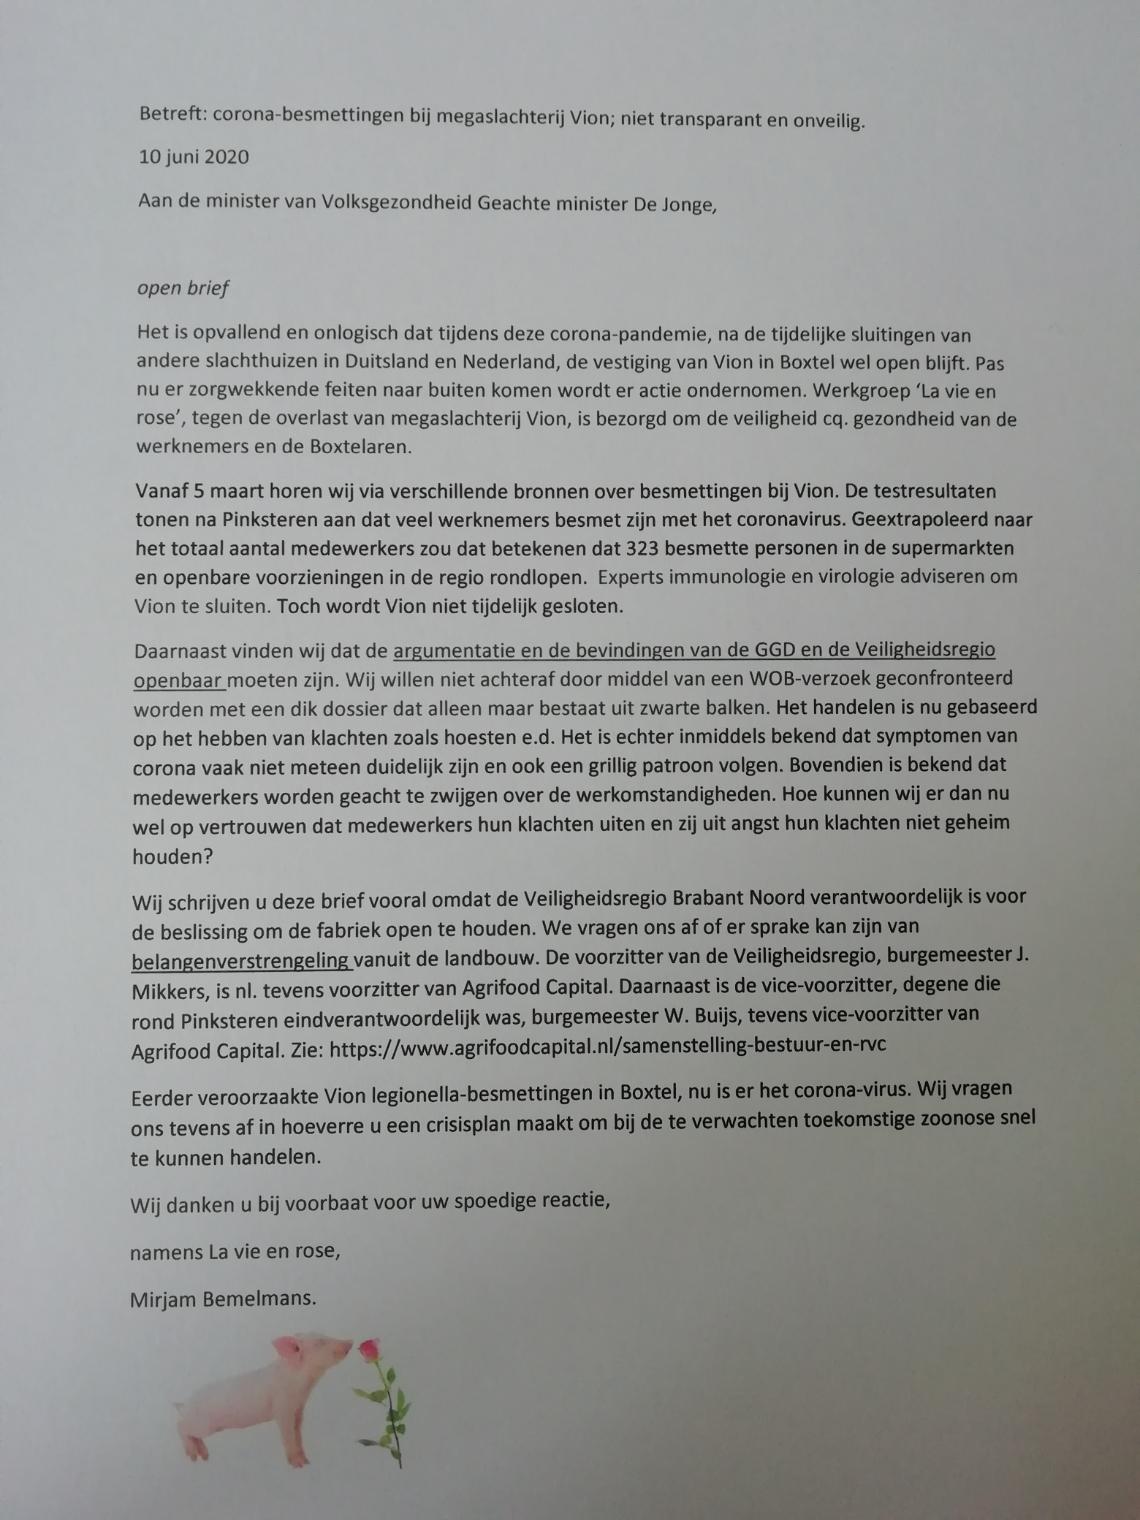 De brief die La Vie en Rose de minister stuurde.